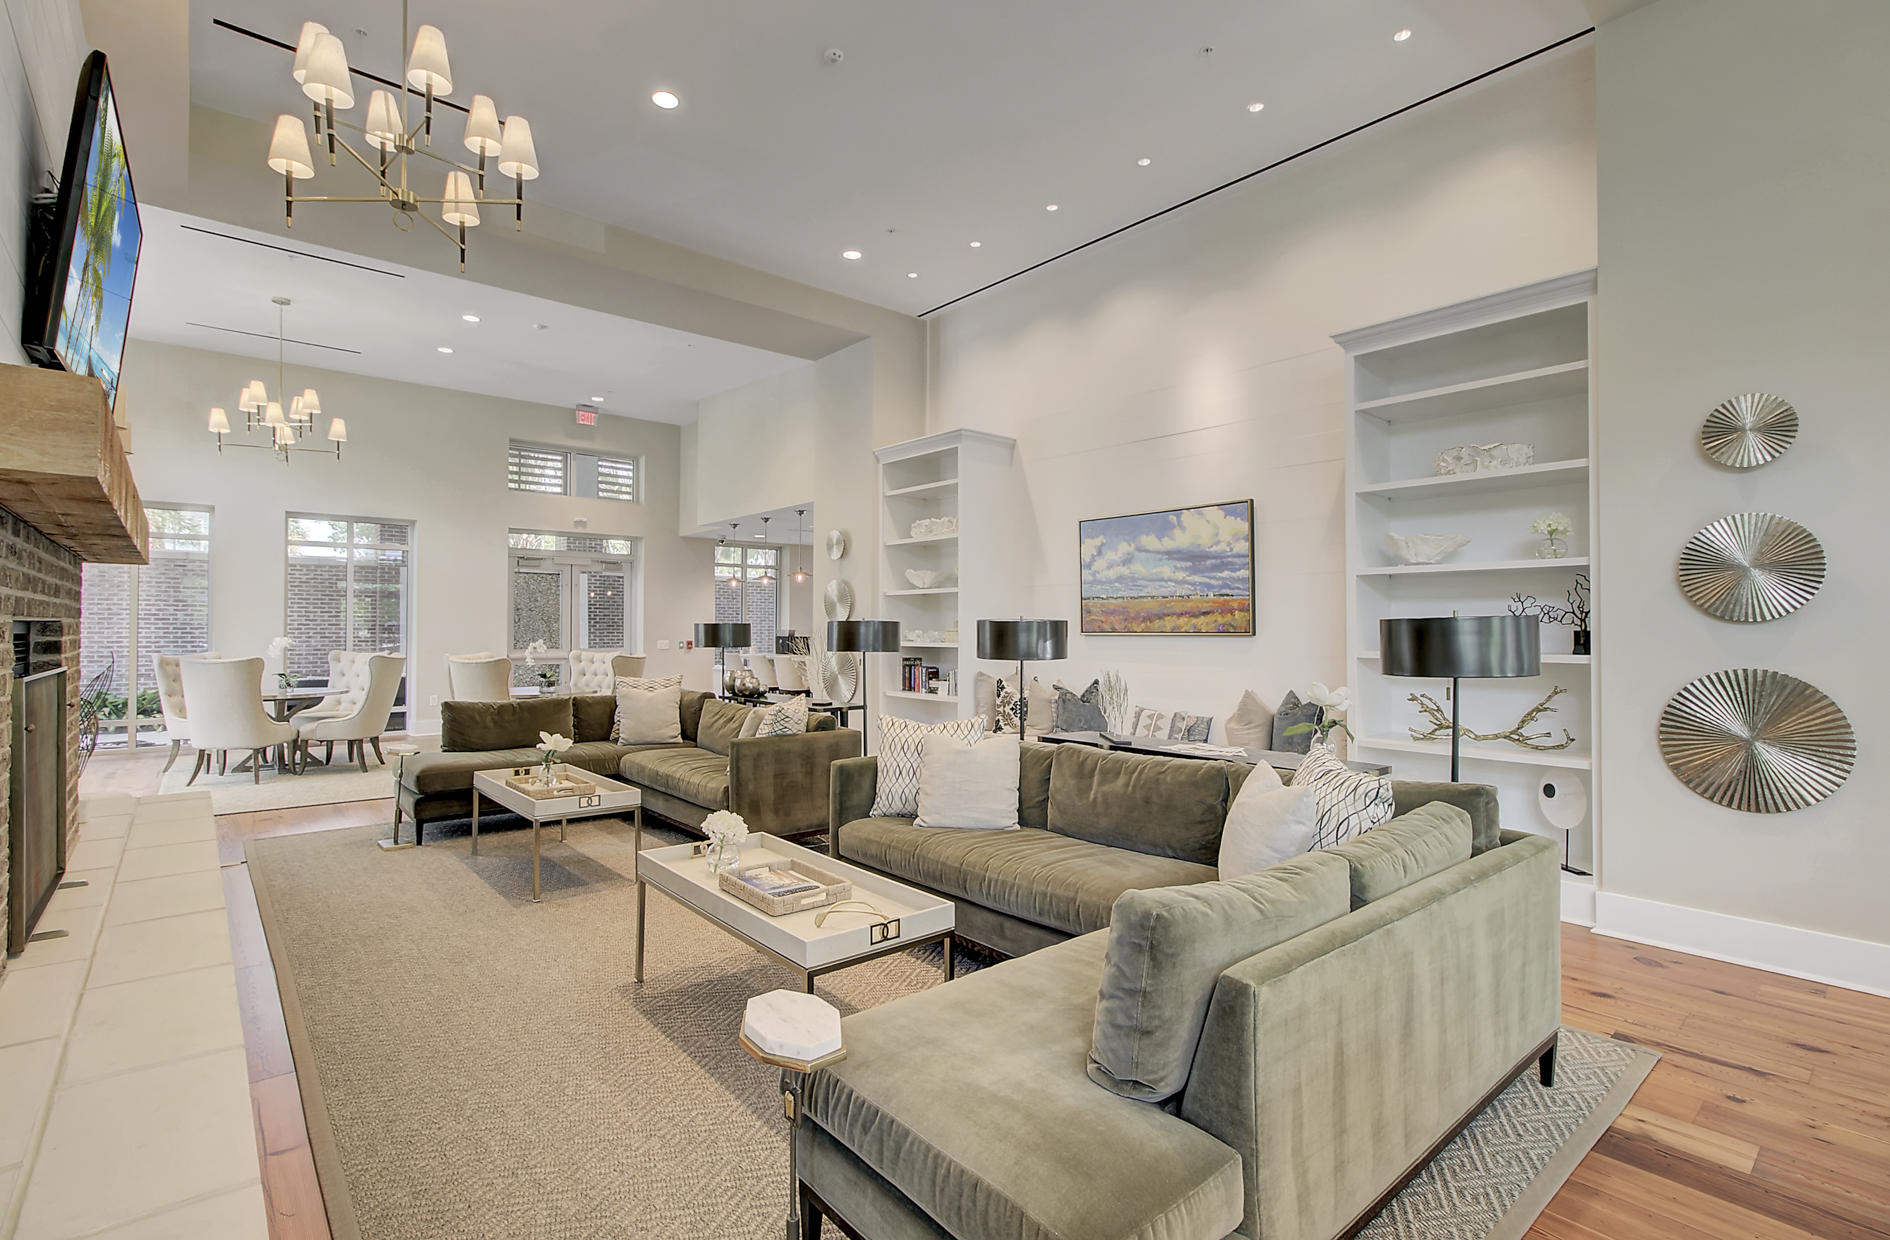 Tides IV Condominiums Homes For Sale - 155 Wingo Way, Mount Pleasant, SC - 14